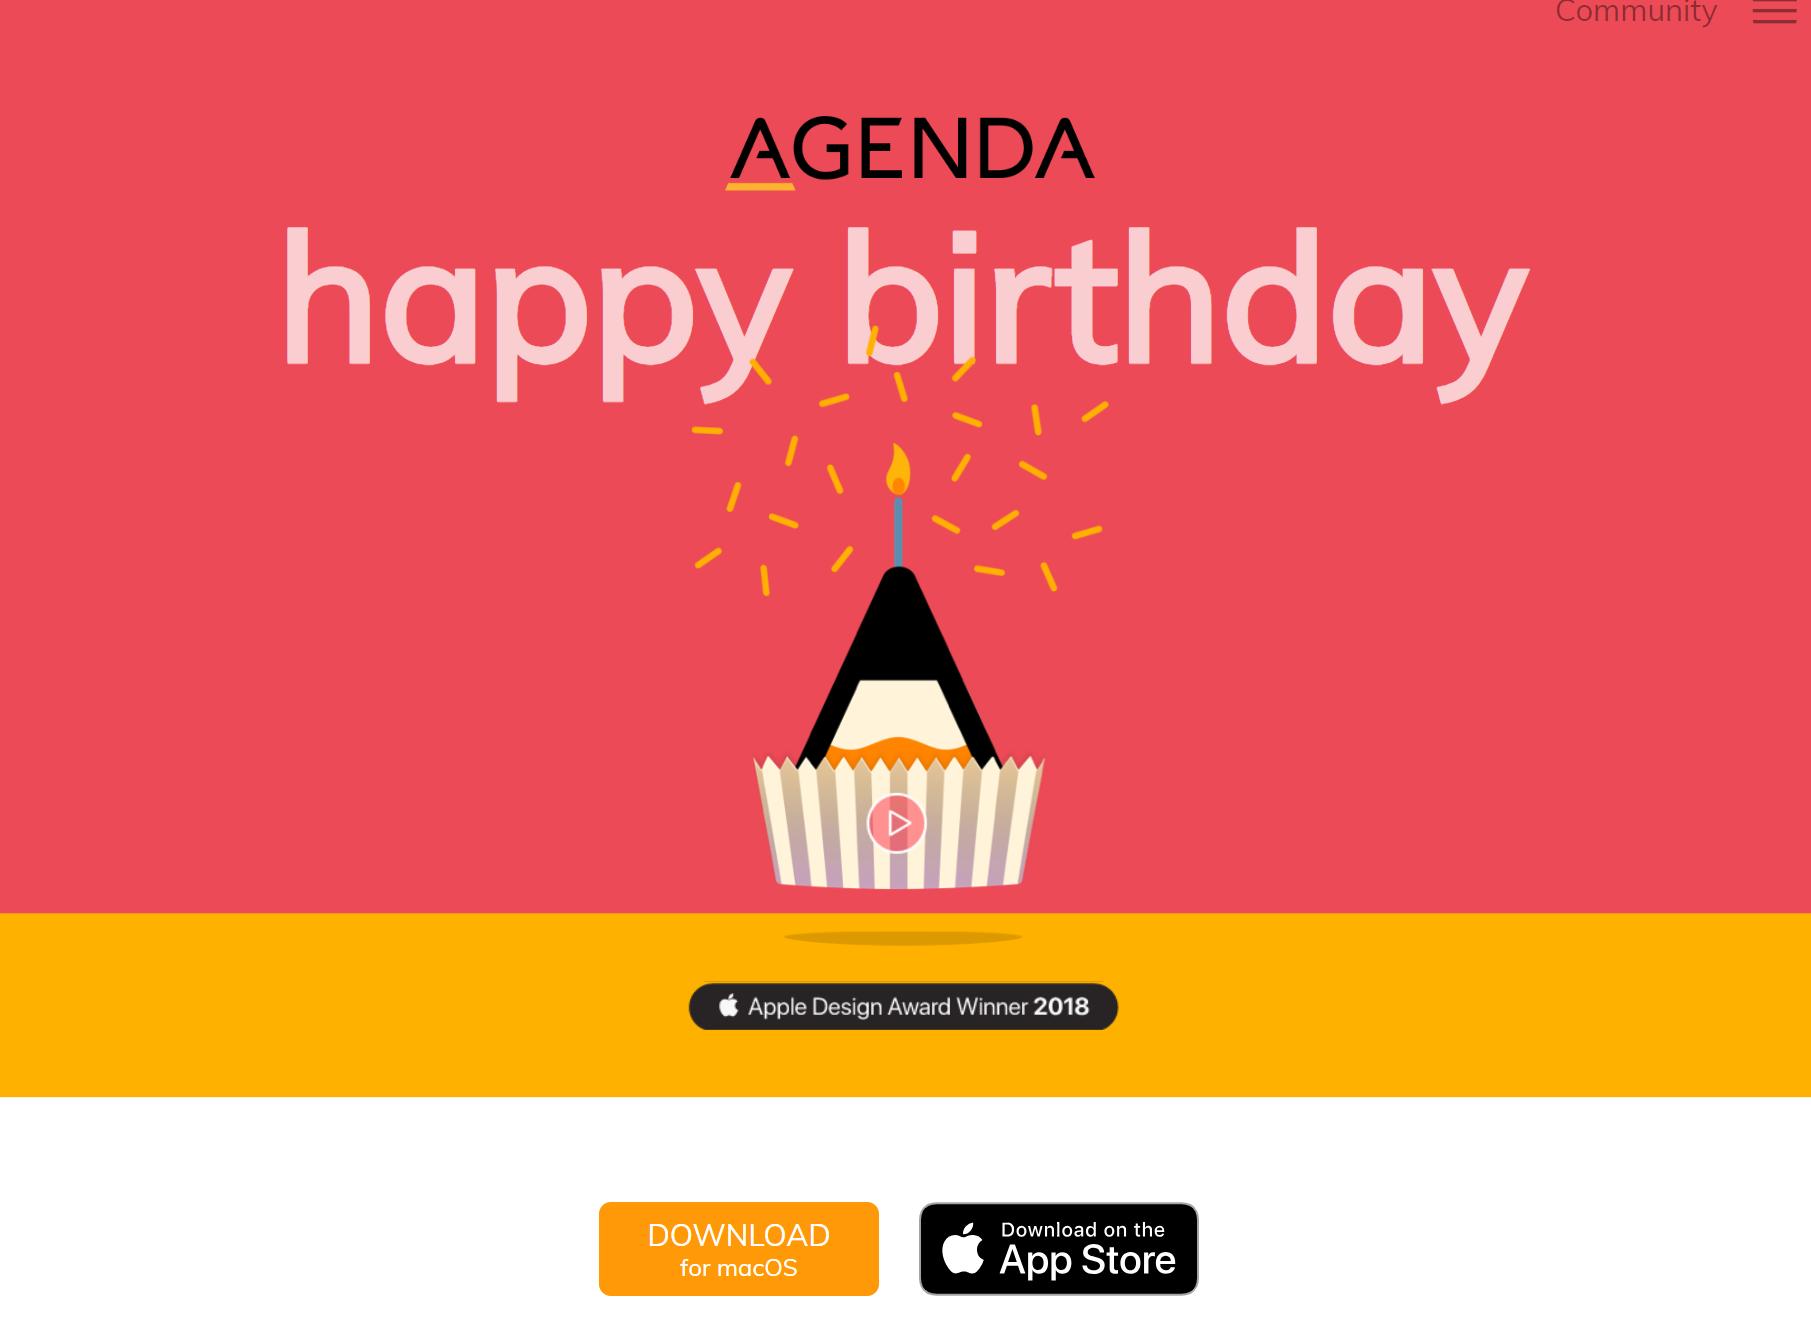 Agenda App Apple Design App Note Taking [ 1328 x 1811 Pixel ]